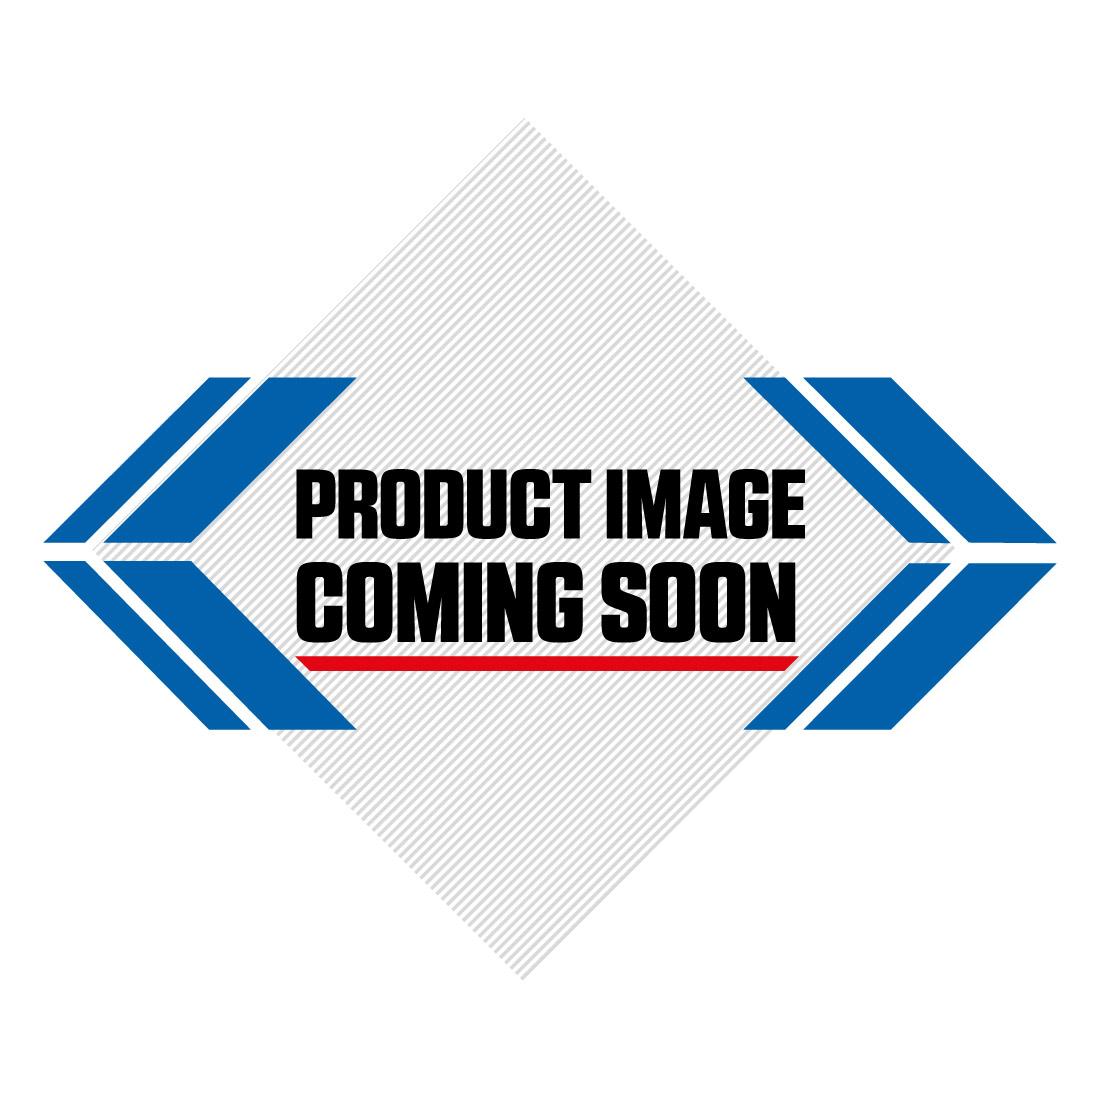 UFO KTM Plastic Kit SX 125 150 250 SXF 250 350 450 (16-18) OEM 16 Image-5>